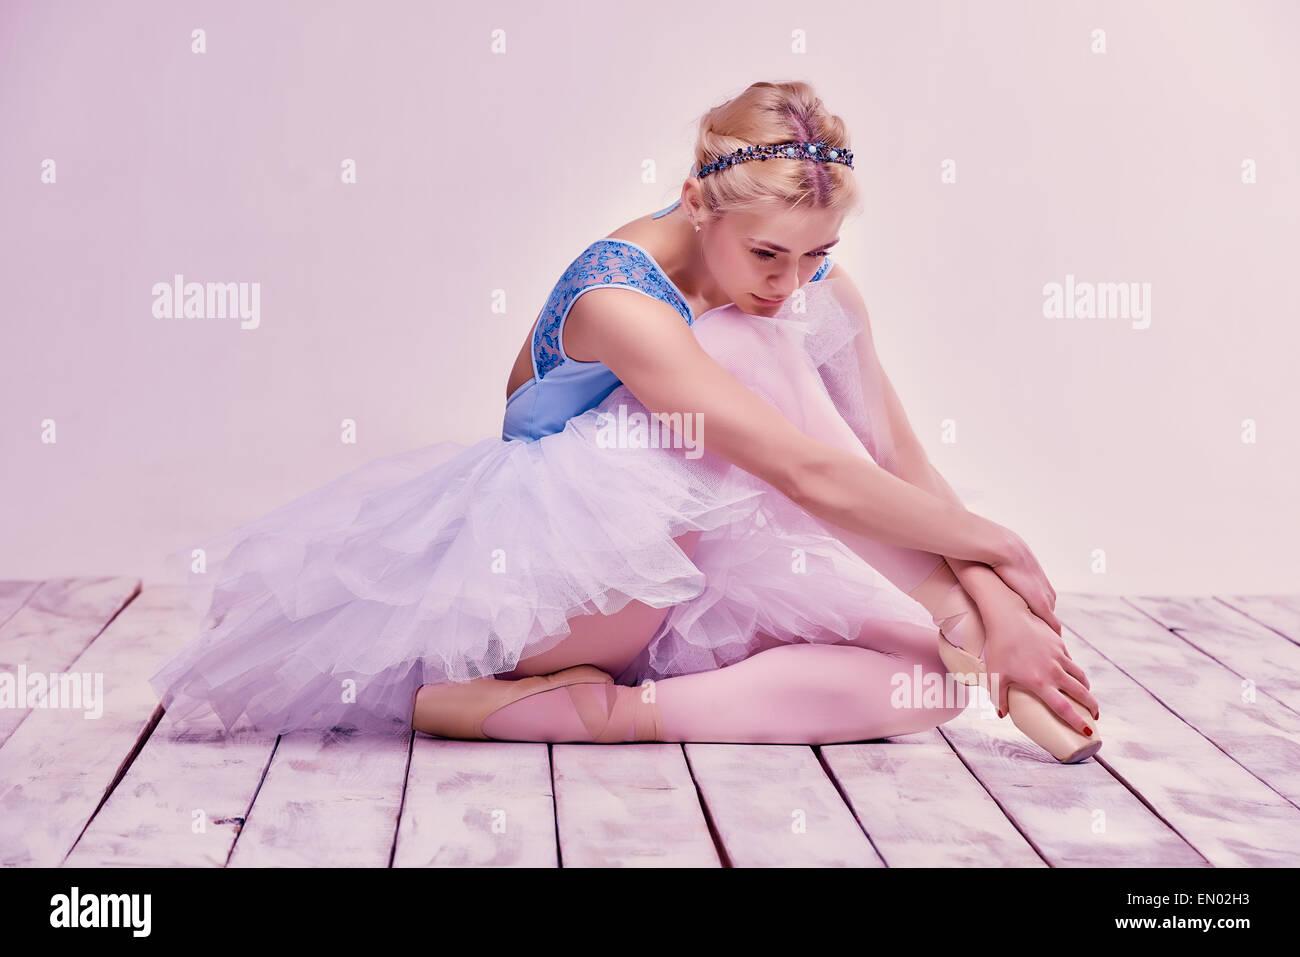 Tired ballet dancer sitting on the wooden floor - Stock Image